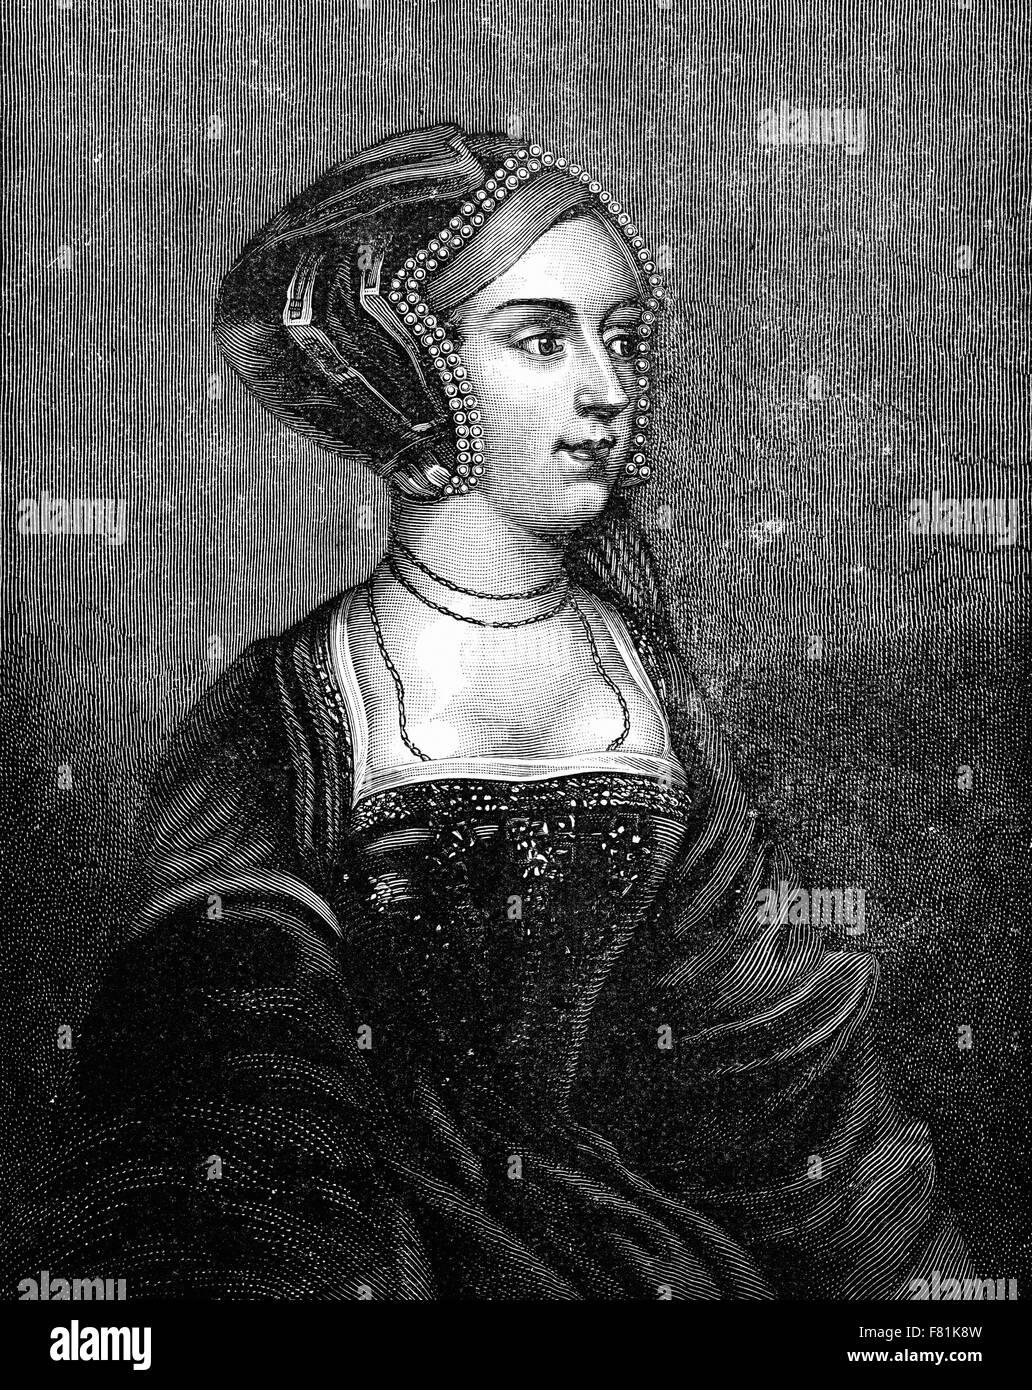 Anne Boleyn second wife of Henry VIII of England, mother of Elizabeth I - Engraving - Stock Image